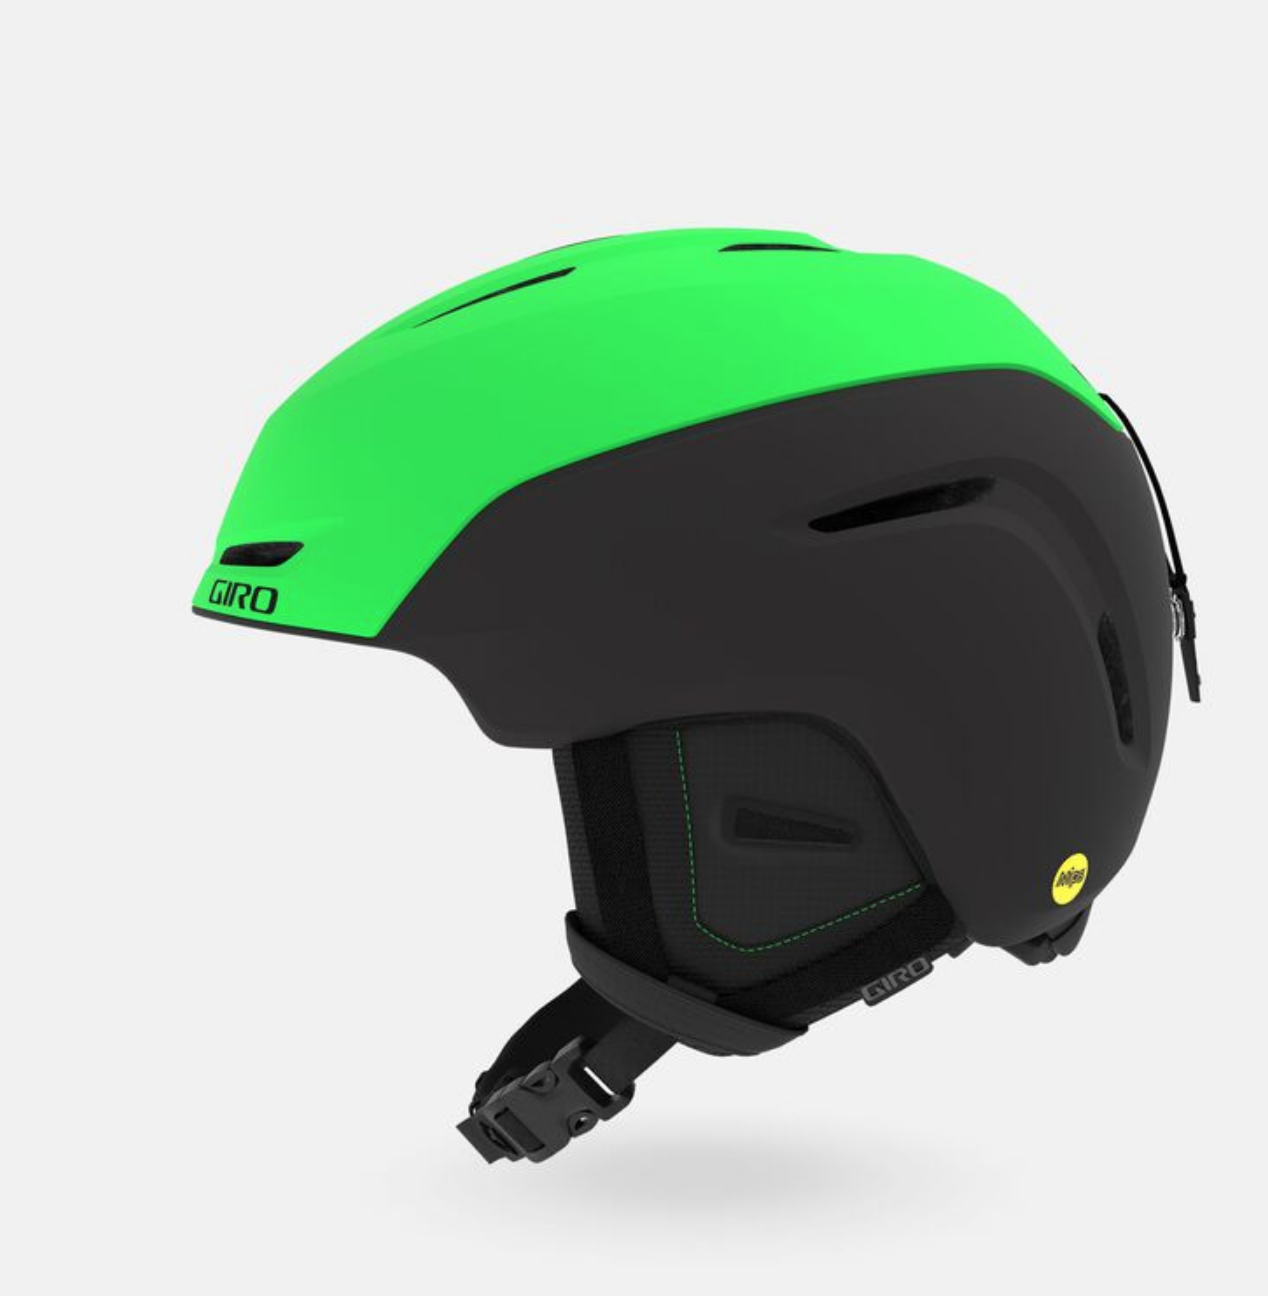 Giro Neo MIPS Snow Helmet - Matte Bright Green / Black